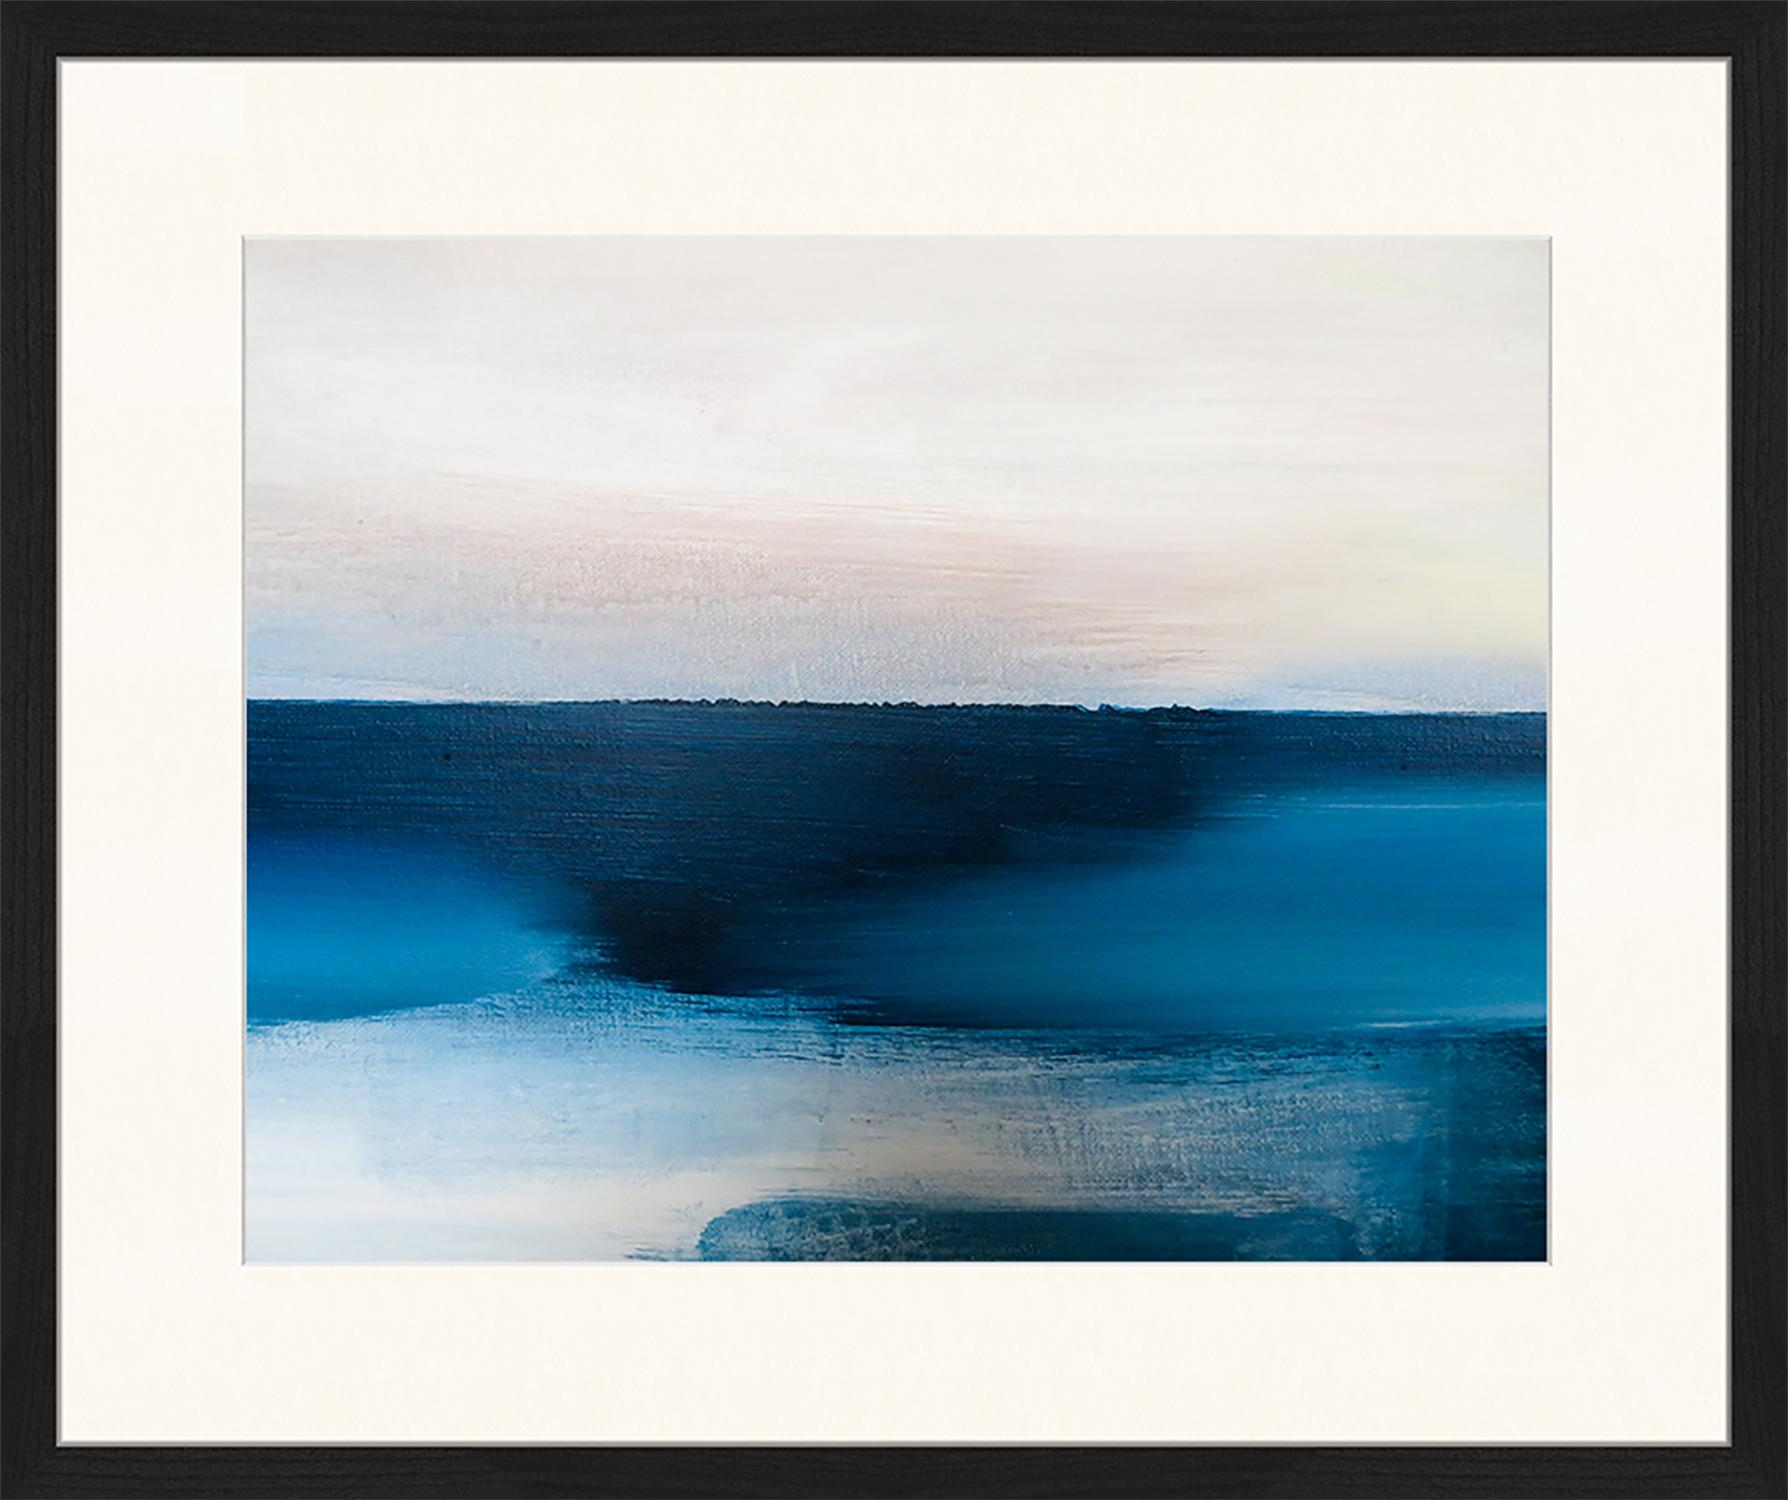 Gerahmter Digitaldruck Blue And Grey Abstract Art, Bild: Digitaldruck auf Papier, , Rahmen: Holz, lackiert, Front: Plexiglas, Mehrfarbig, 63 x 53 cm